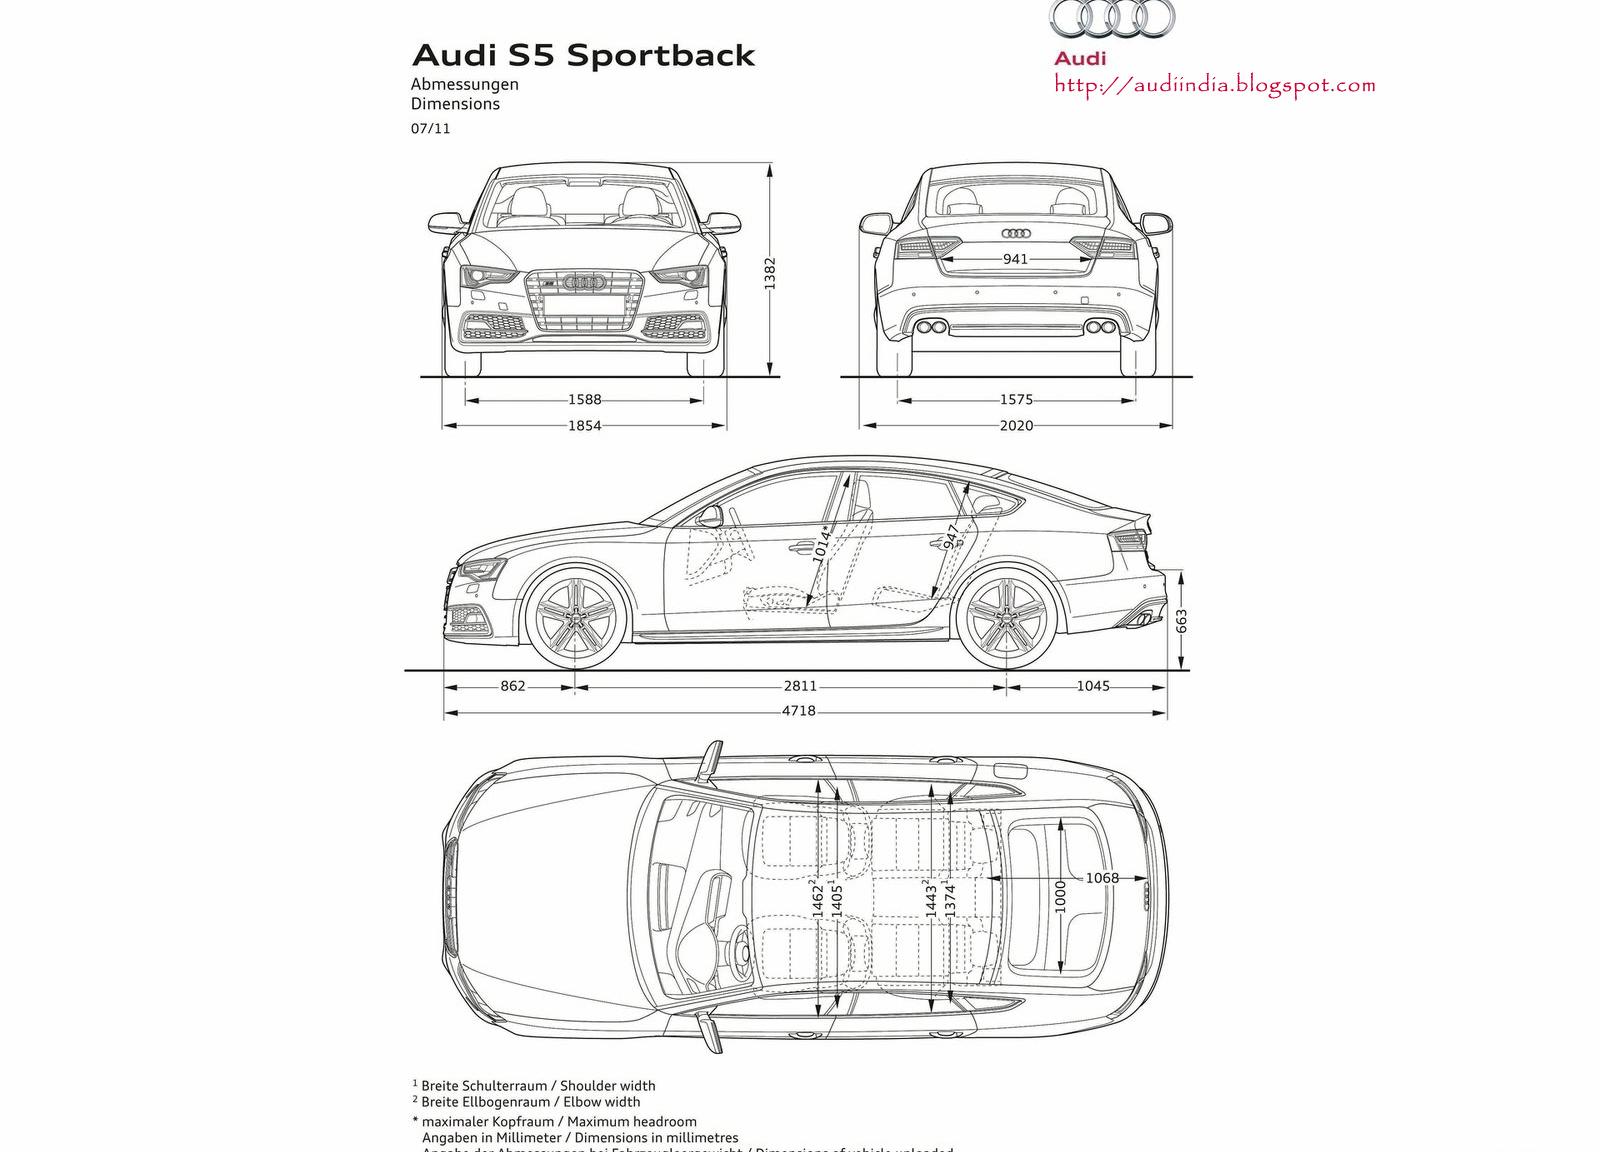 sportback hd wallpaper audi s5 sportback v6 tfsi engine wallpaper 1600x1152